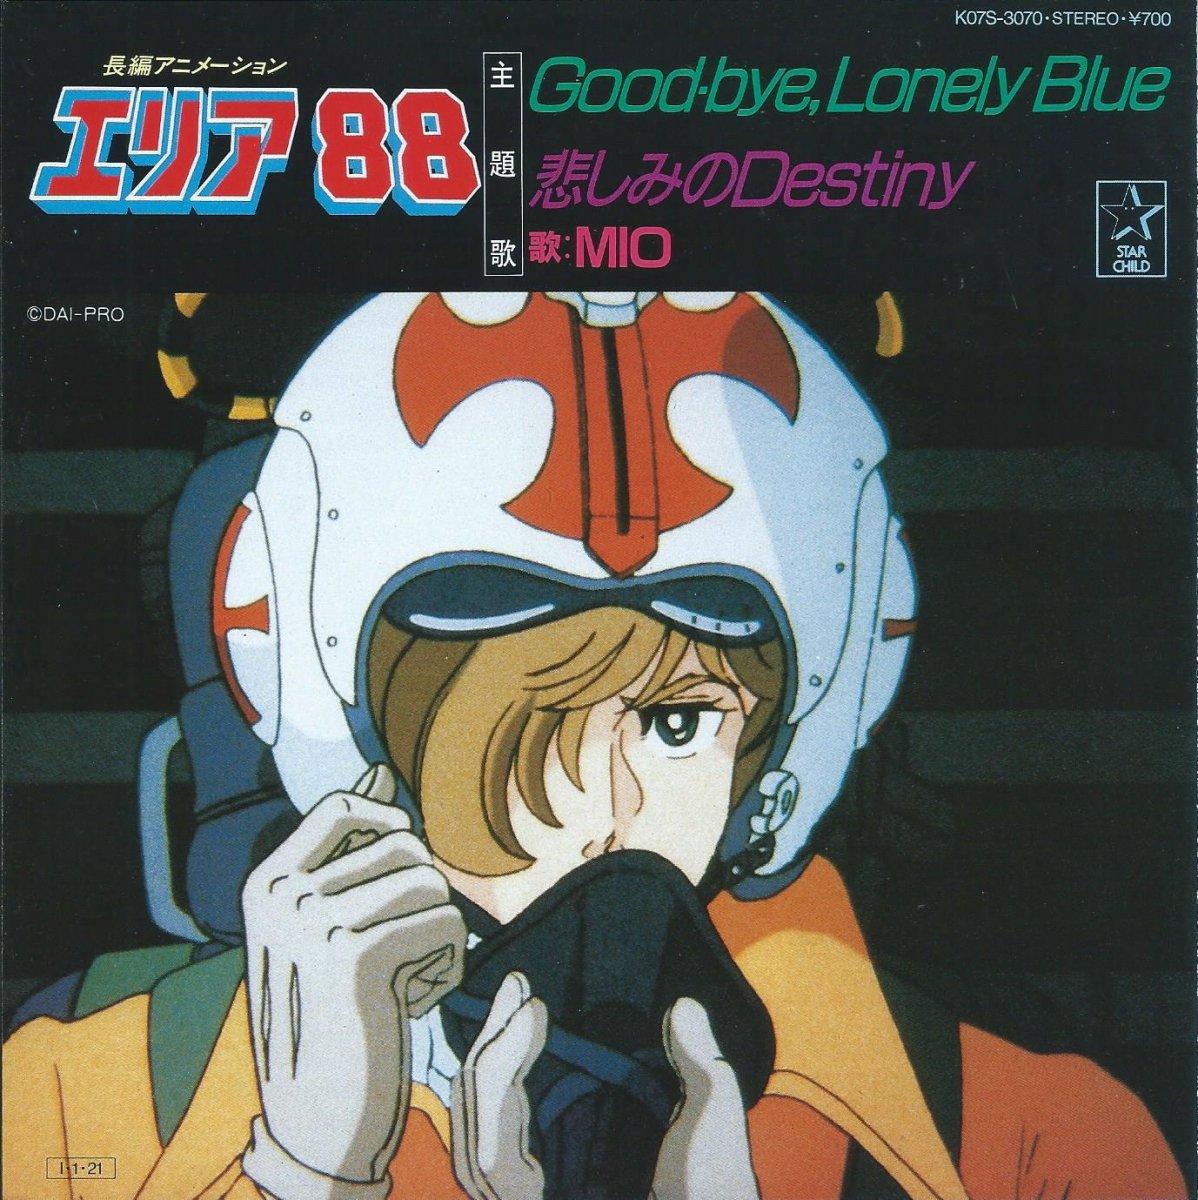 MIO (新田一郎) / GOOD BYE,LONELY BLUE / 悲しみのDESTINY (7